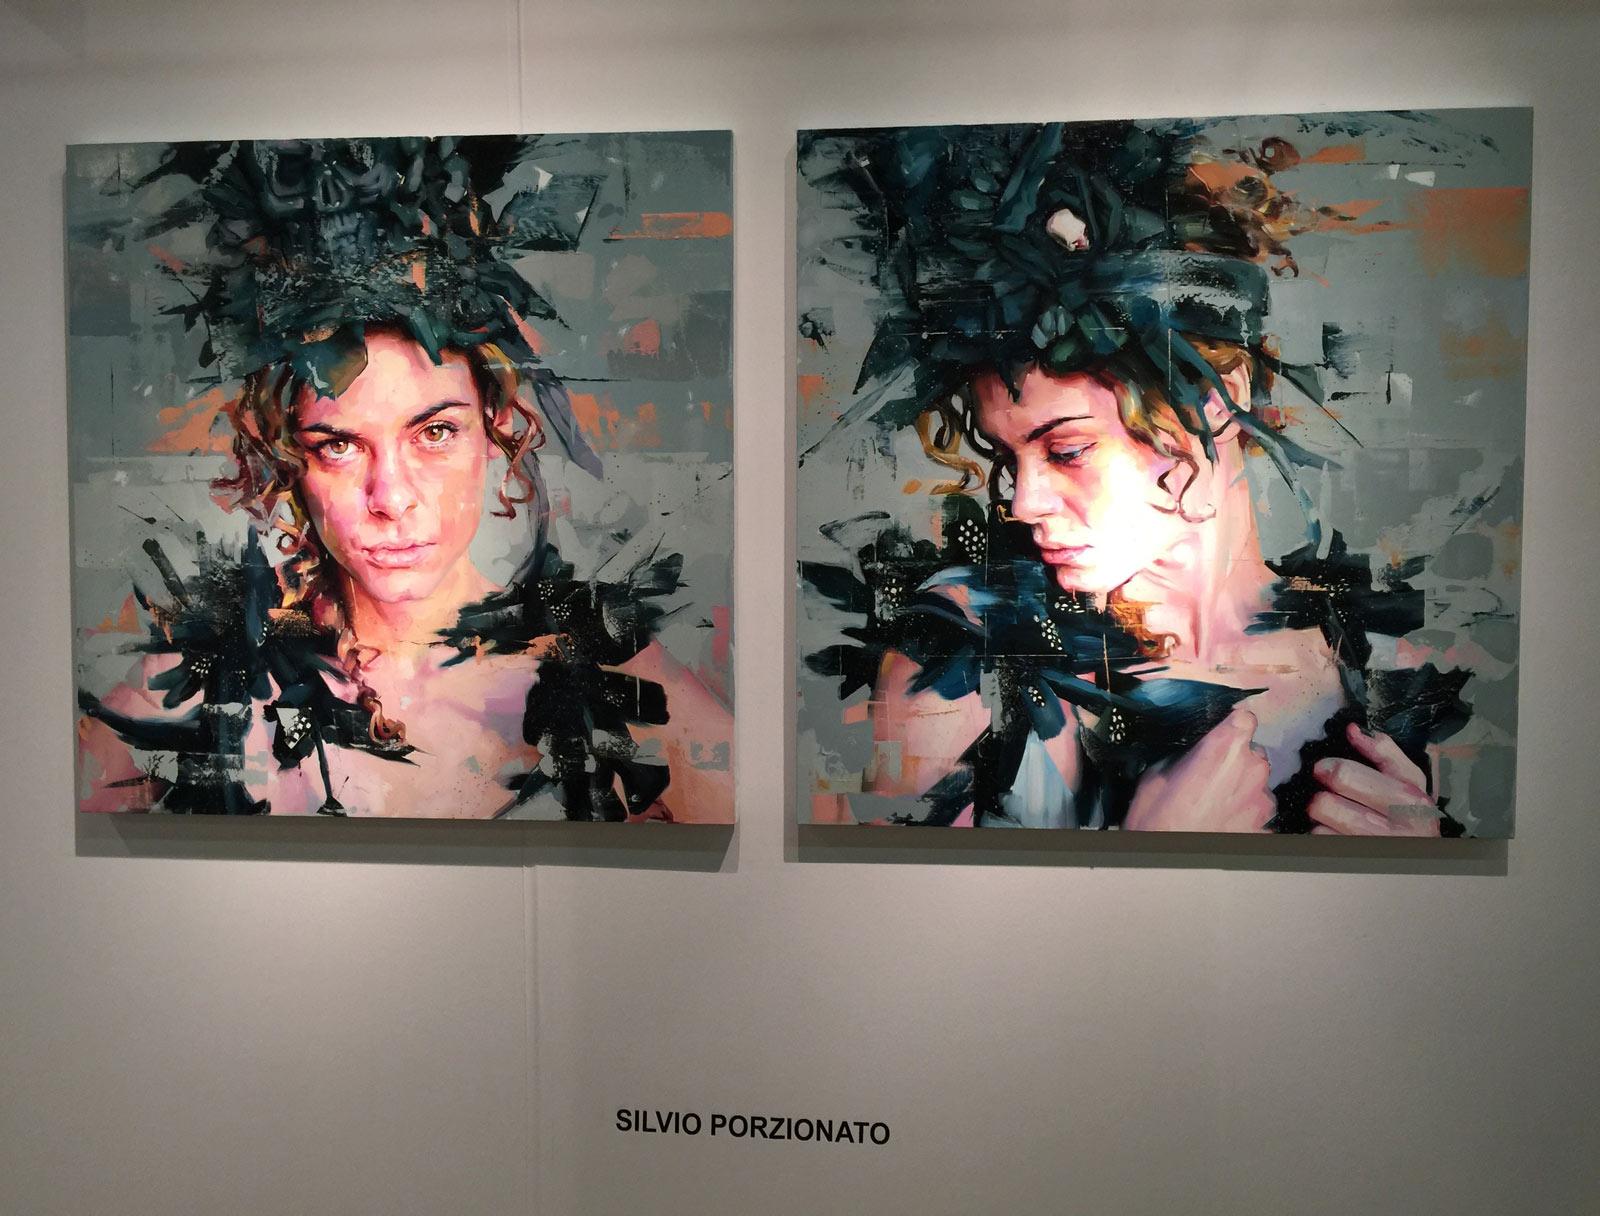 Silvio-Porzionato-Black-Series-oil-canvas-paintings-Liquid-Art.jpg